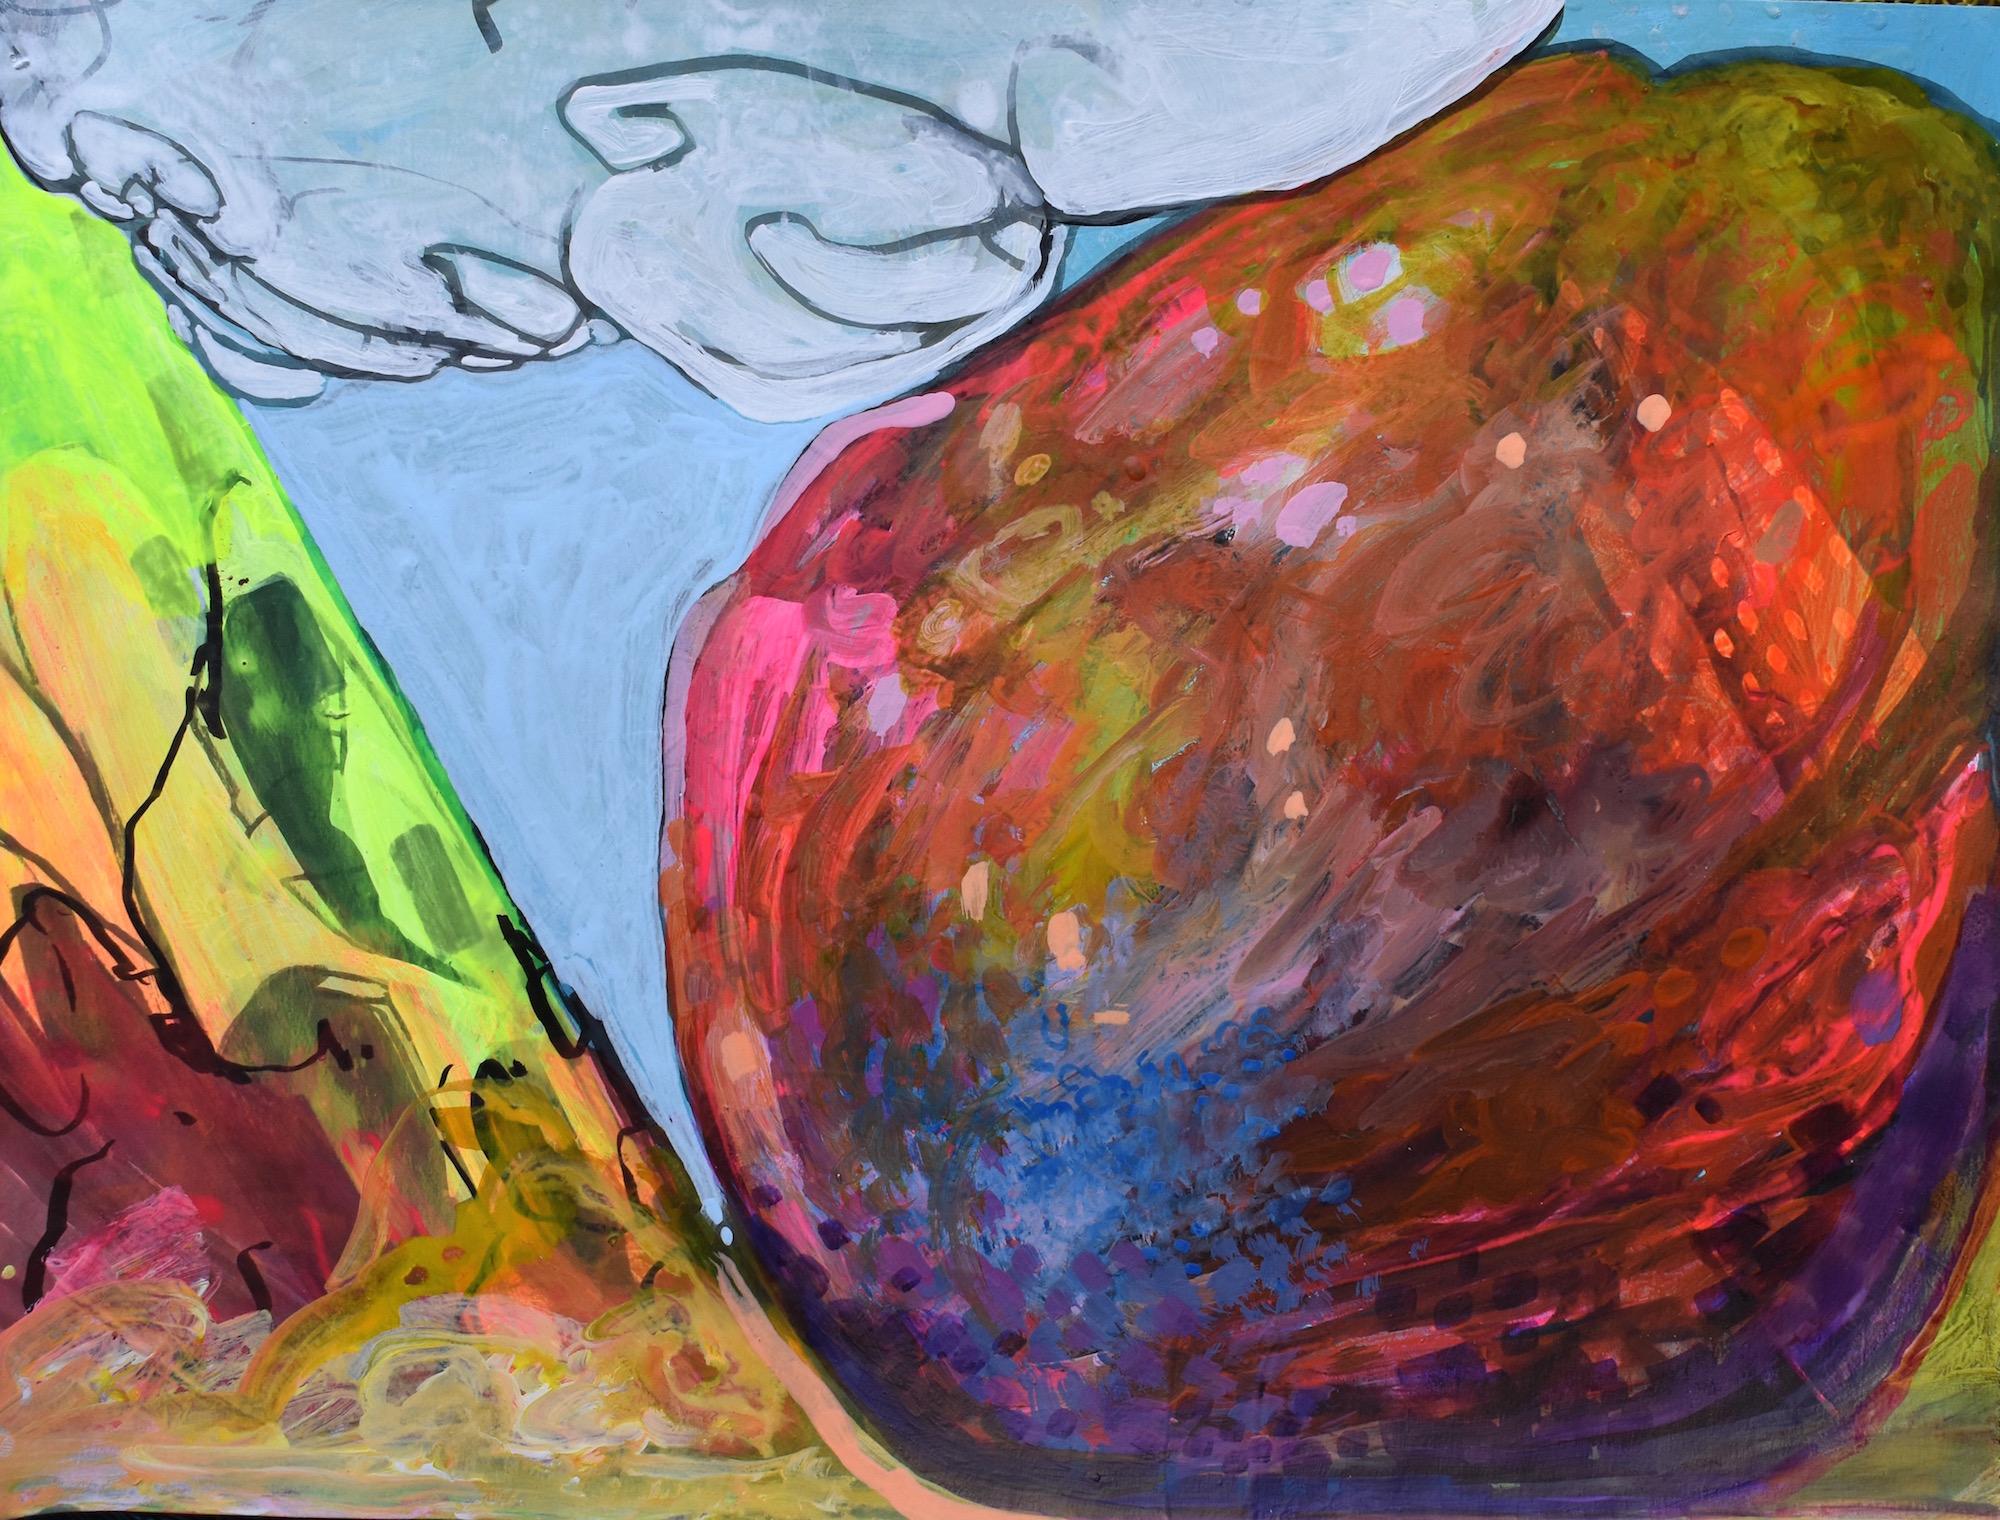 Untitled (1) - 9x12.jpg